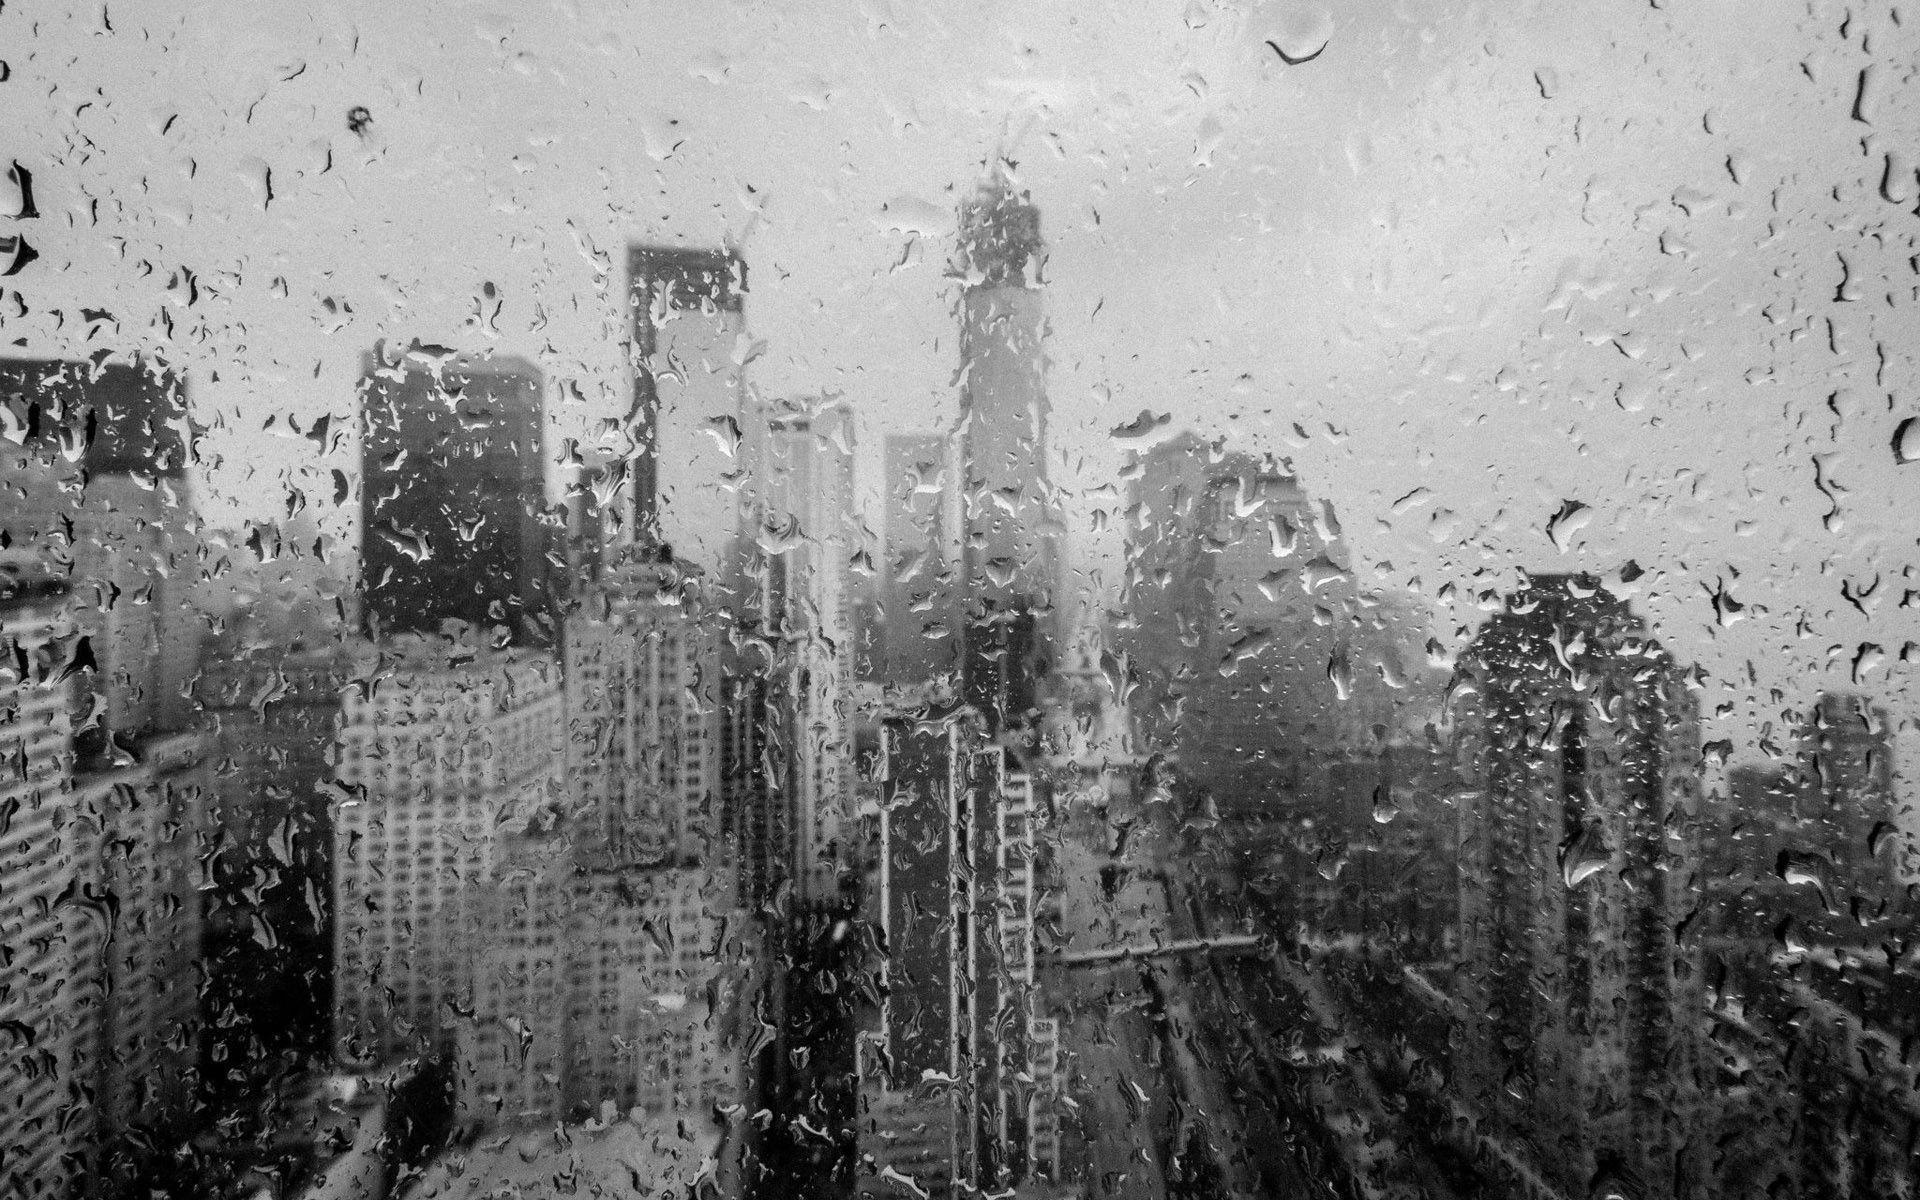 City View Through Wet Window Wallpaper